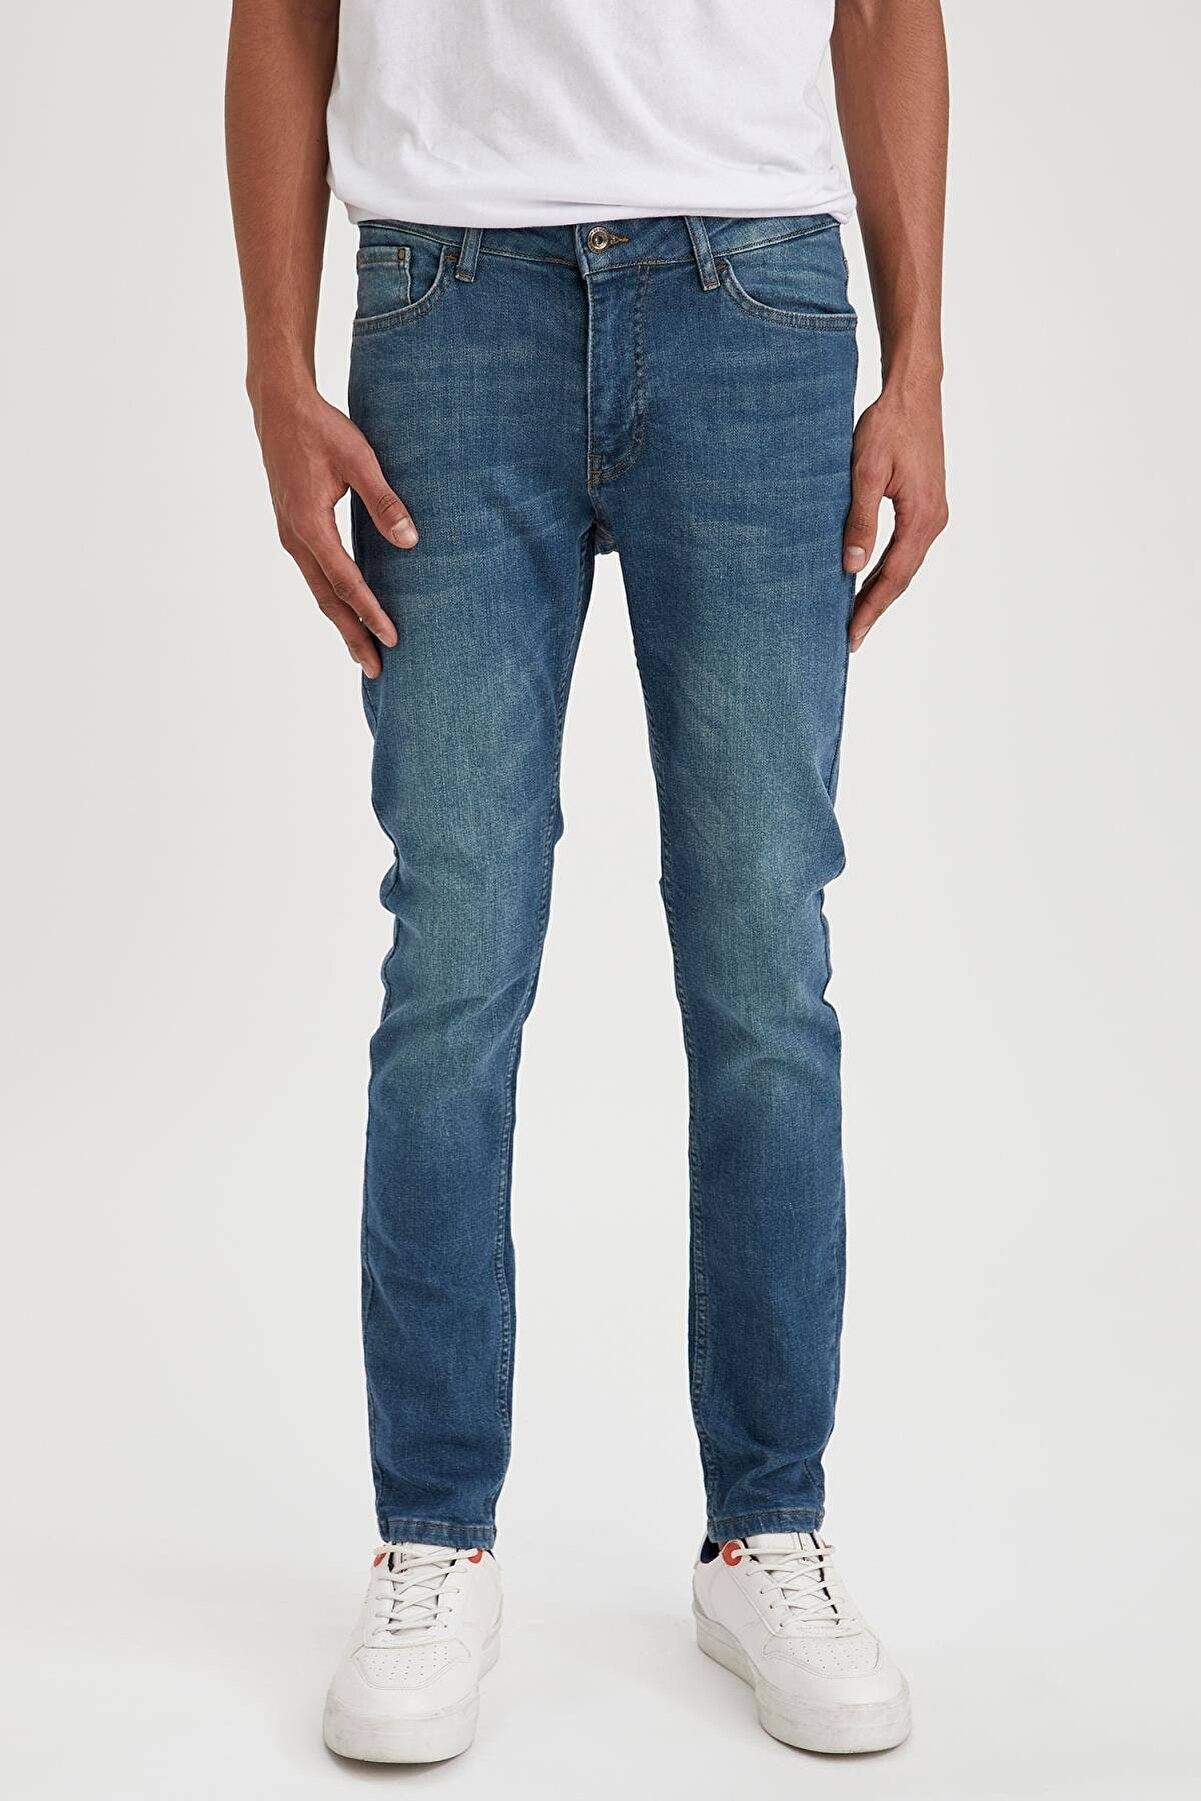 Defacto Martin Super Skinny Fit Düşük Bel Dar Paça Jean Pantolon